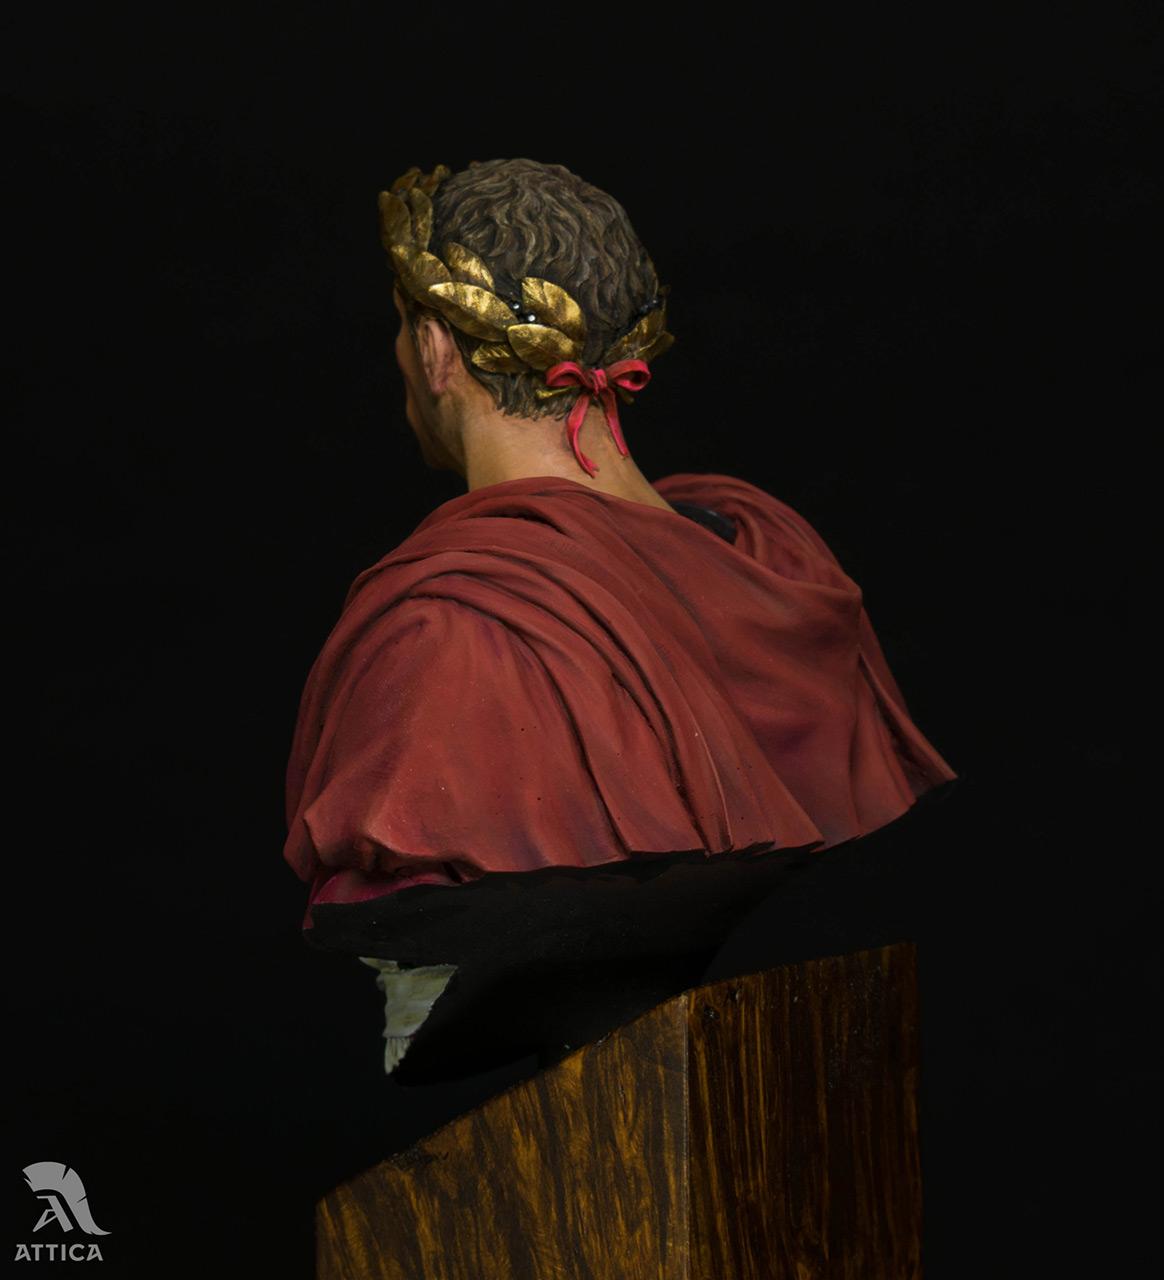 Figures: The Triumpher, photo #4